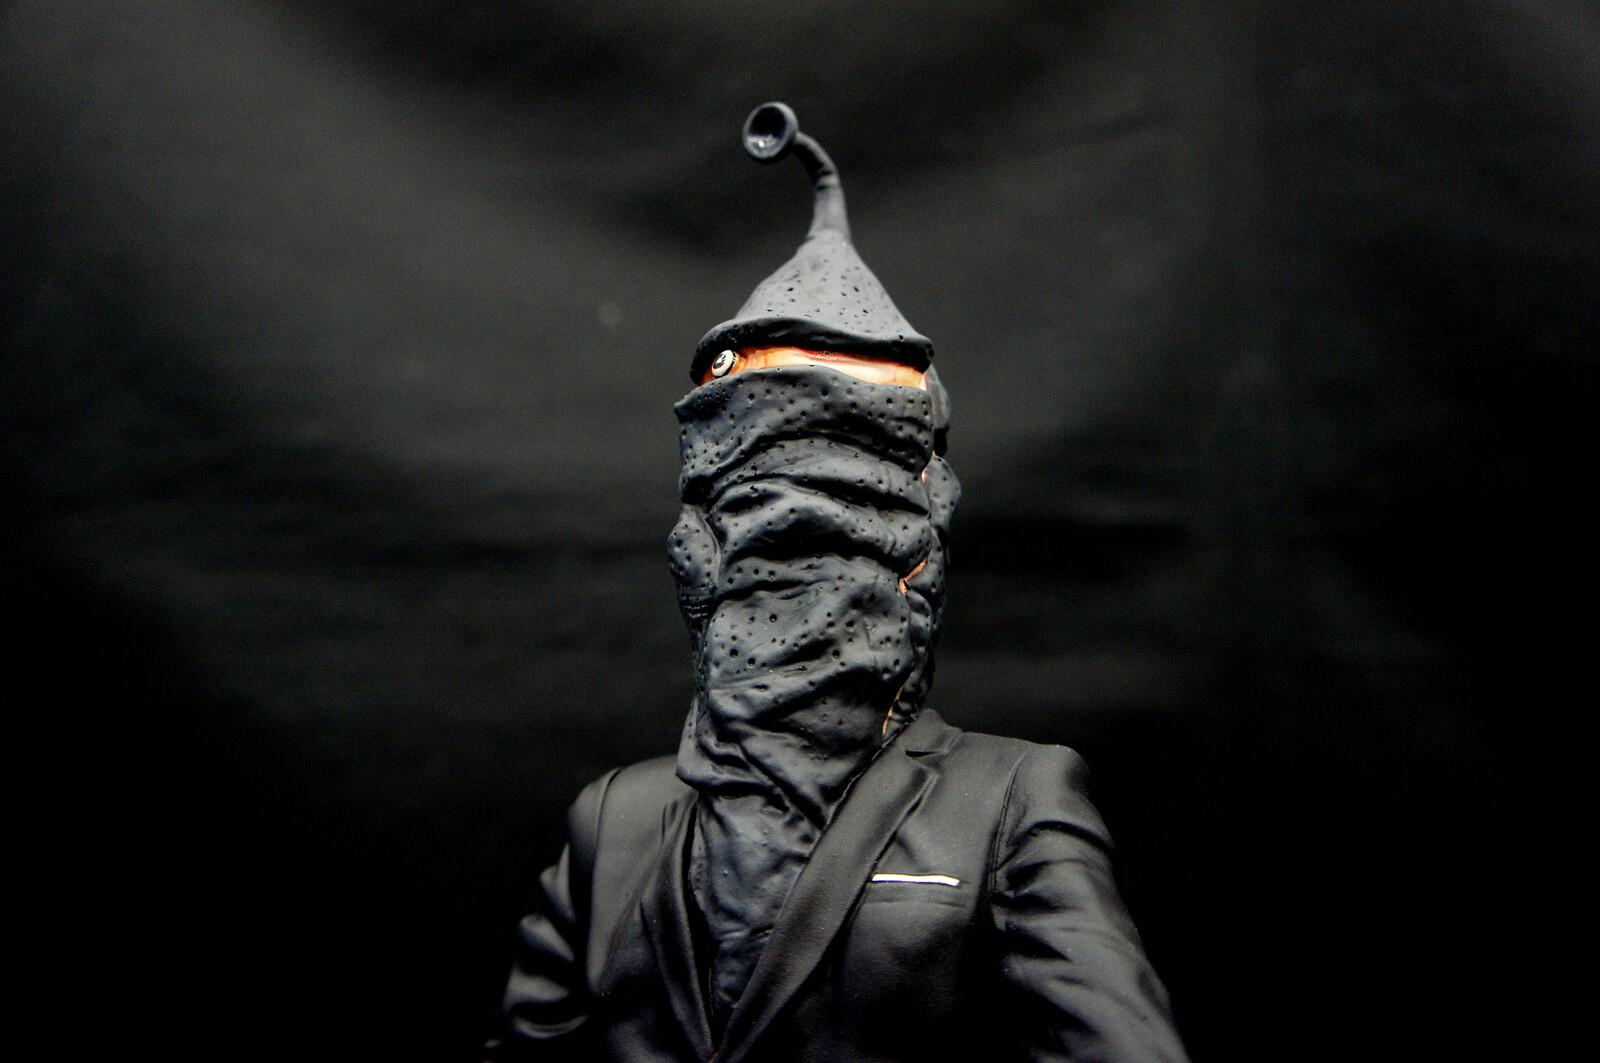 Zeton Jin Art Statue 変身怪人「ゼットン星人」 https://www.solidart.club/